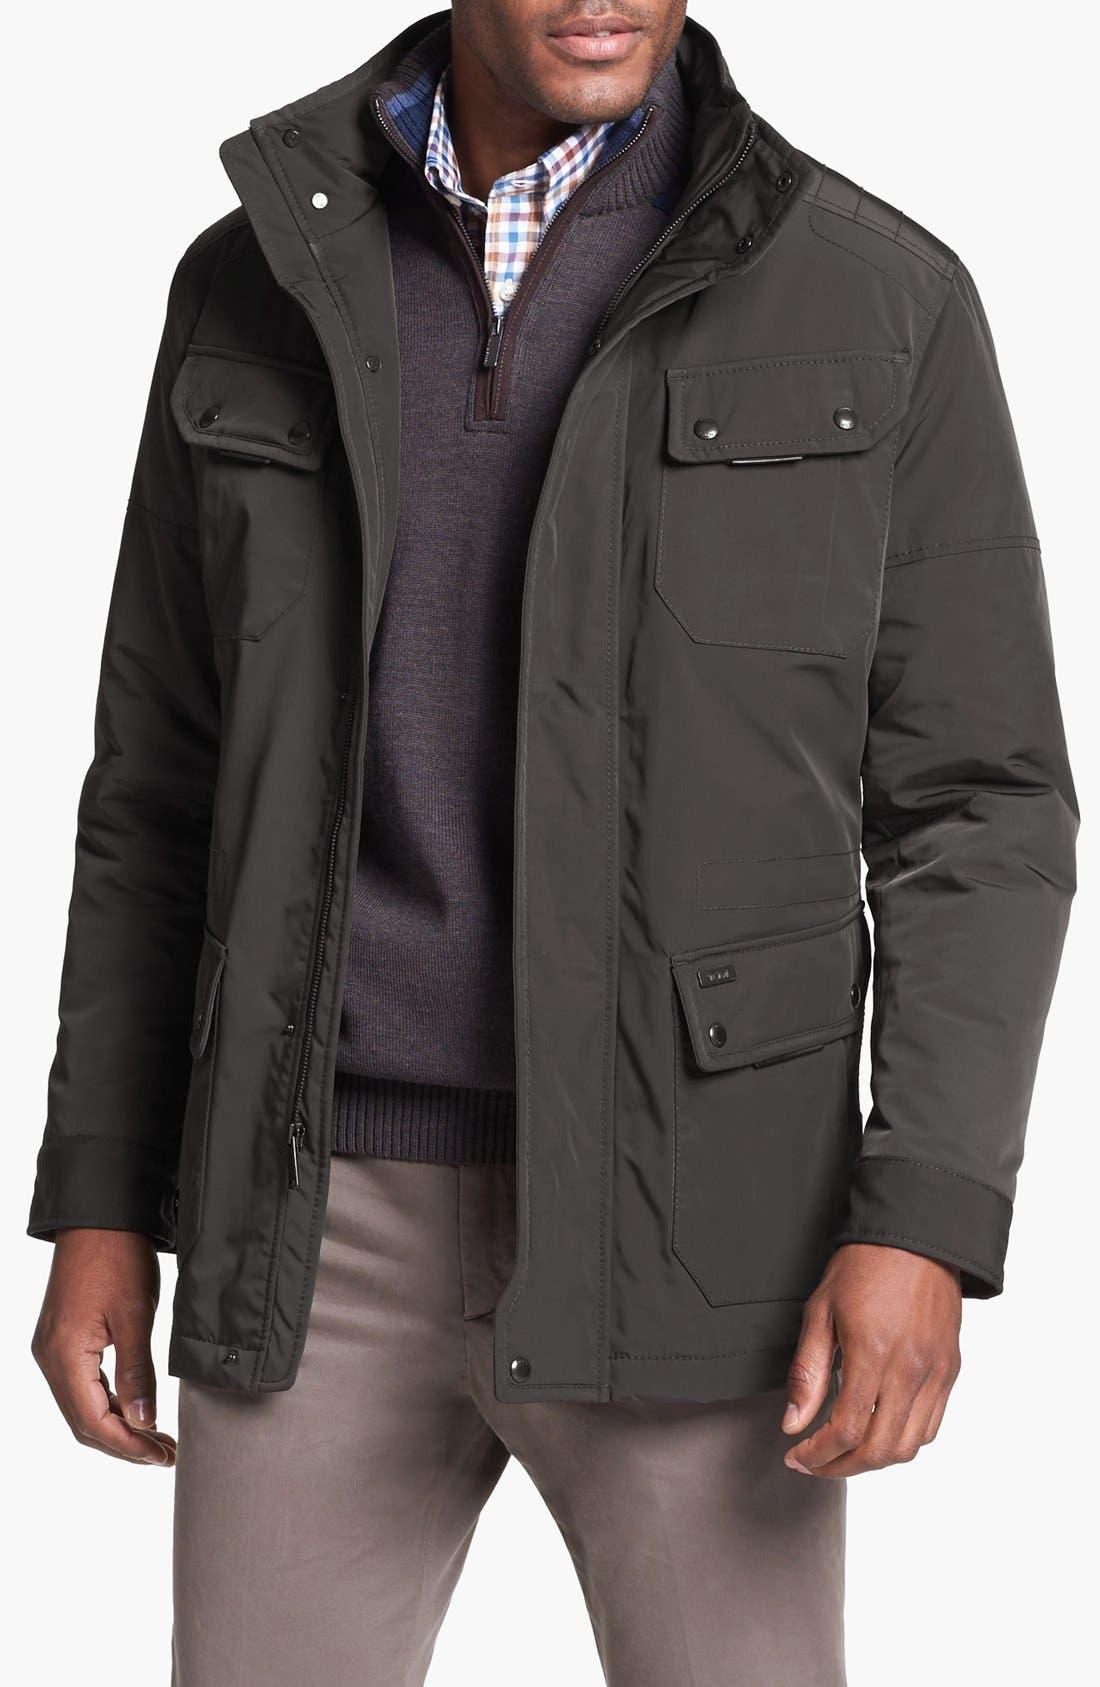 Alternate Image 1 Selected - Tumi Micro Ballistic Hooded Insulated Jacket